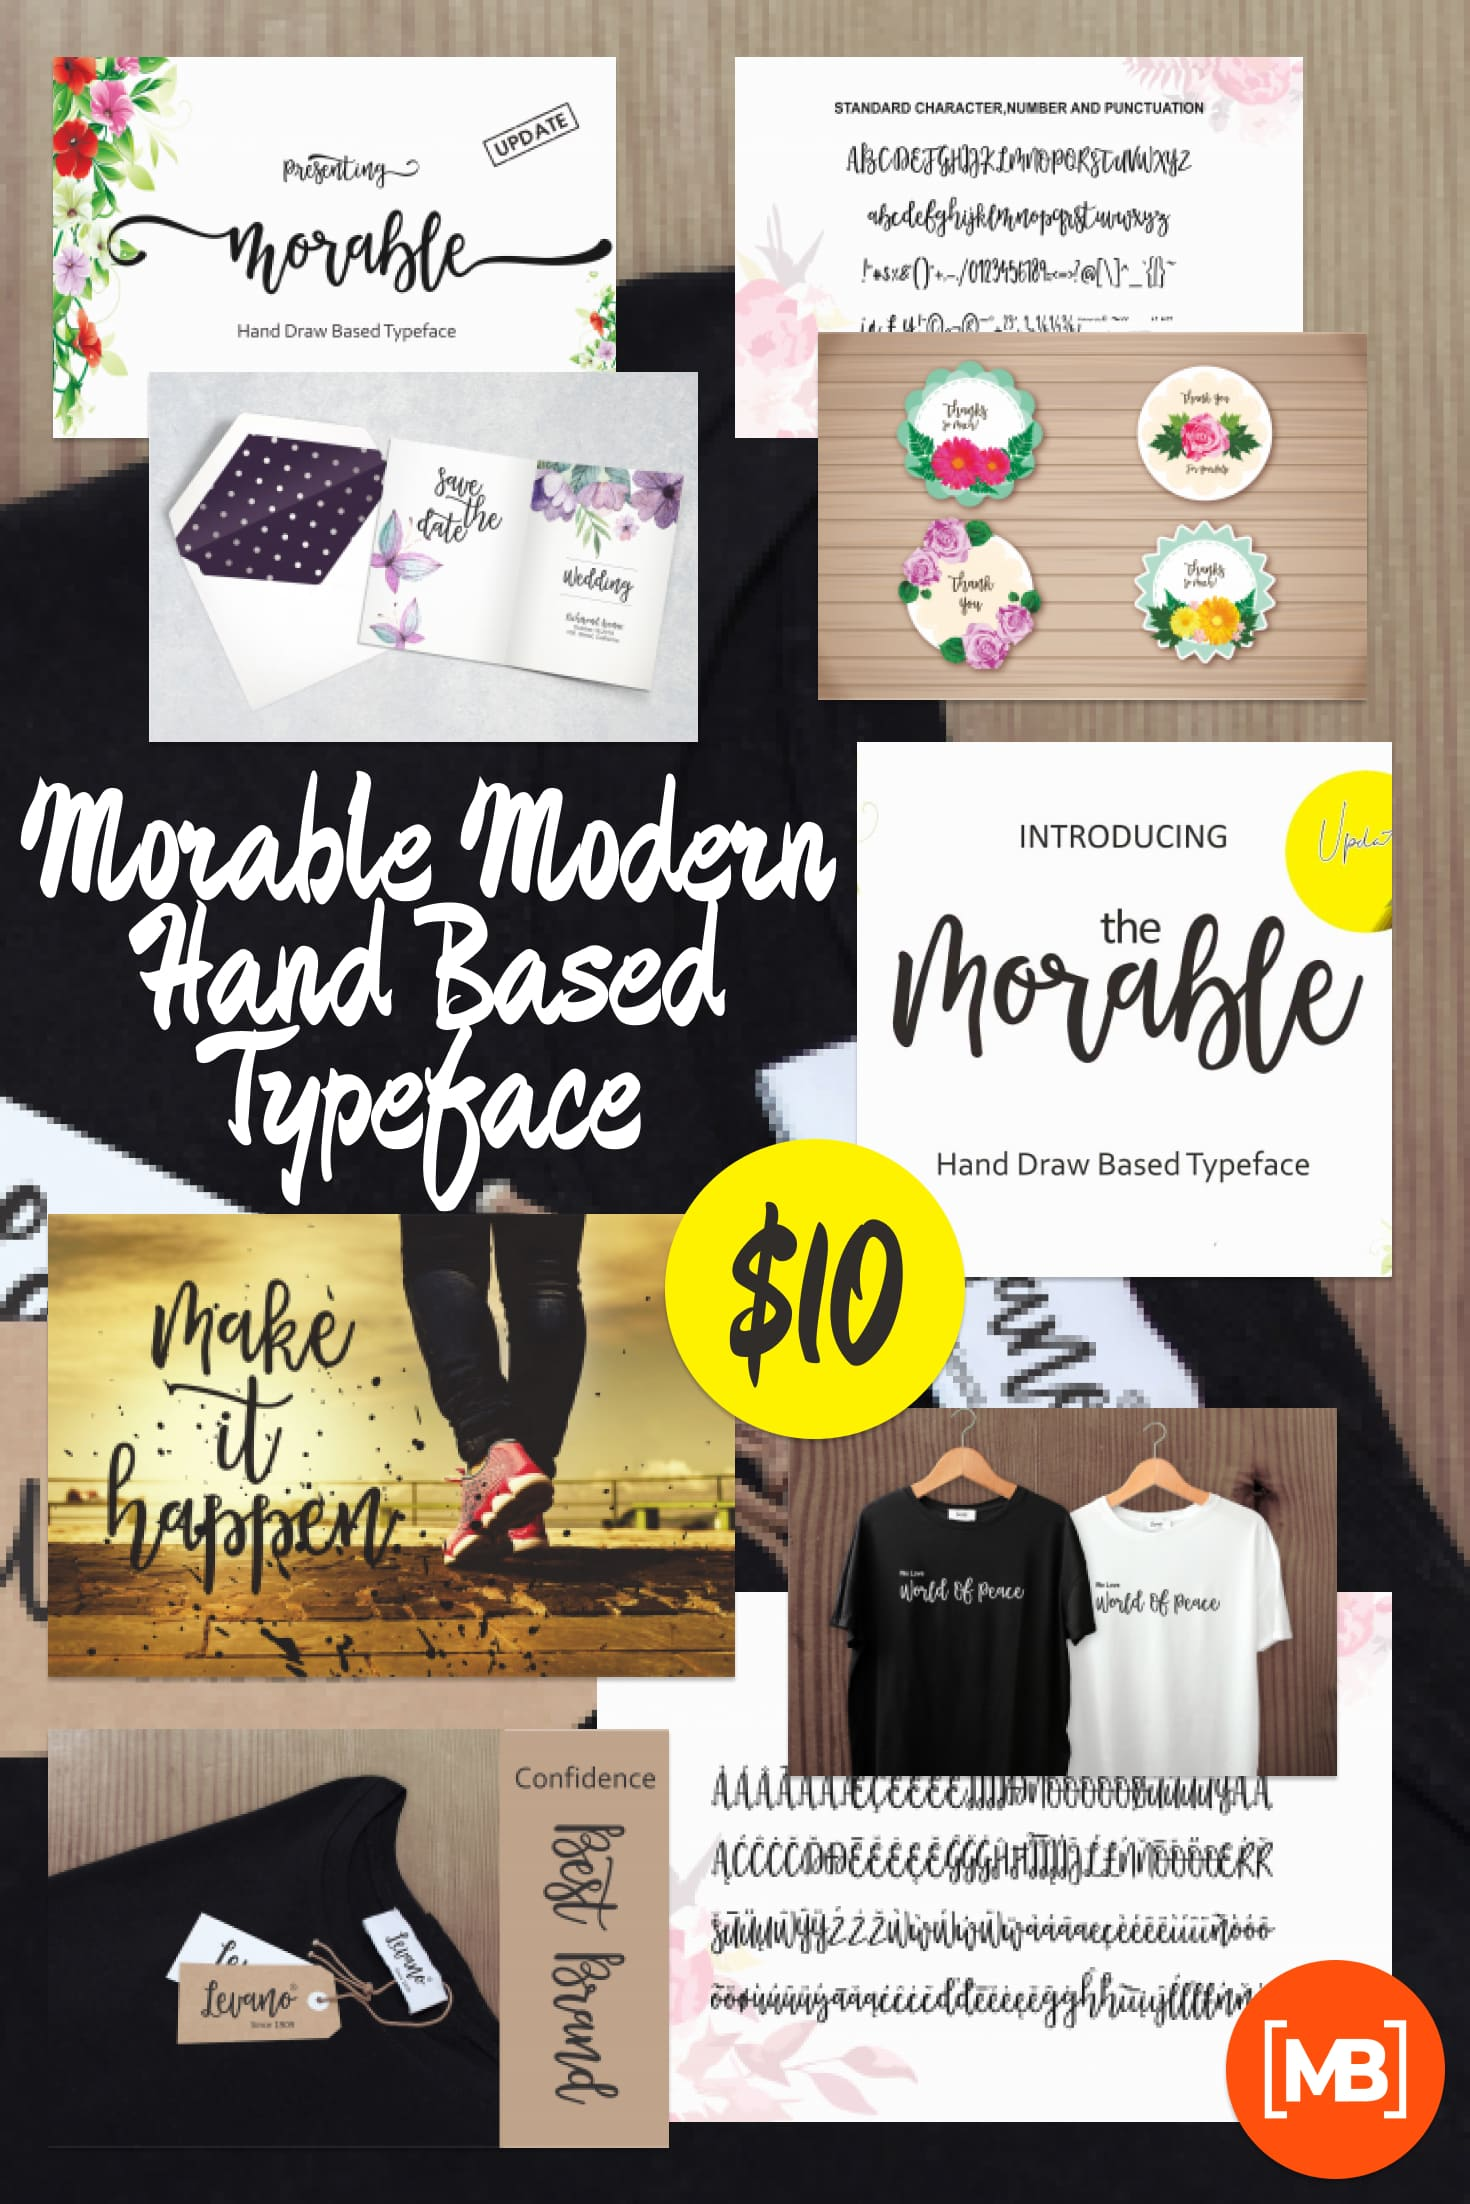 Pinterest Image: Morable Modern Hand Based Typeface - $10.